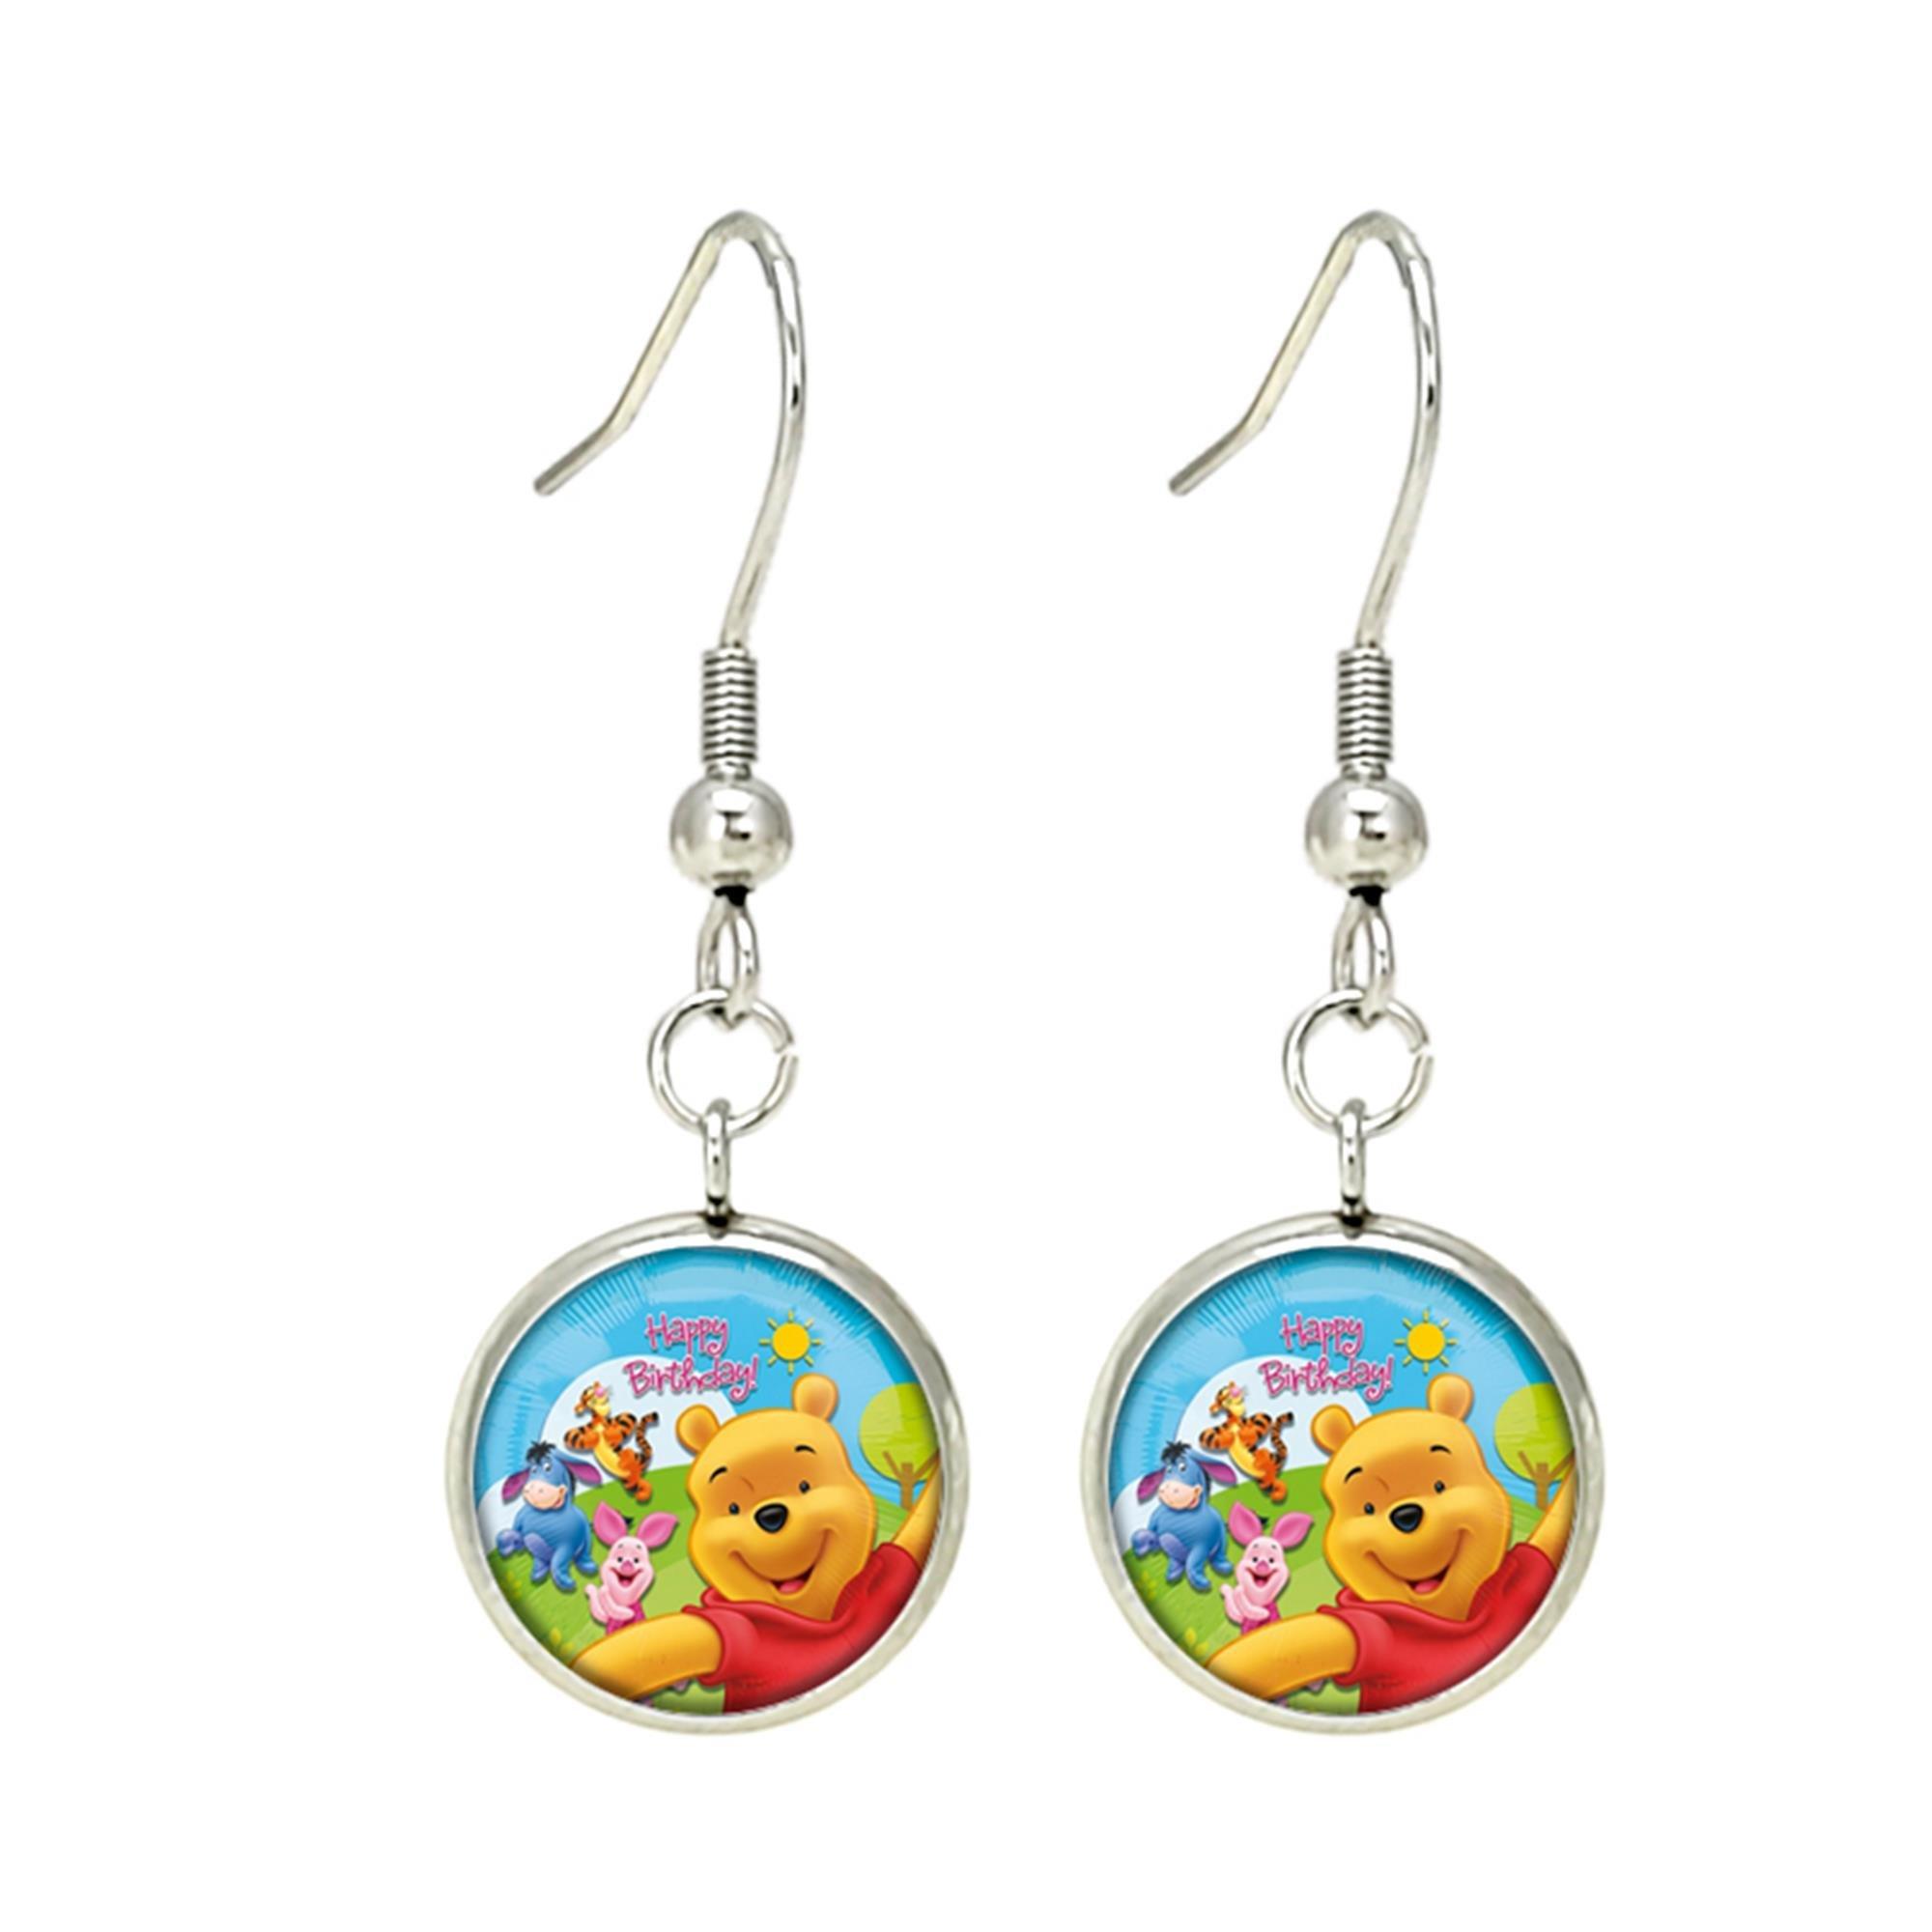 Winnie the Pooh Disney Premium Quality Silvertone Dangle Earrings